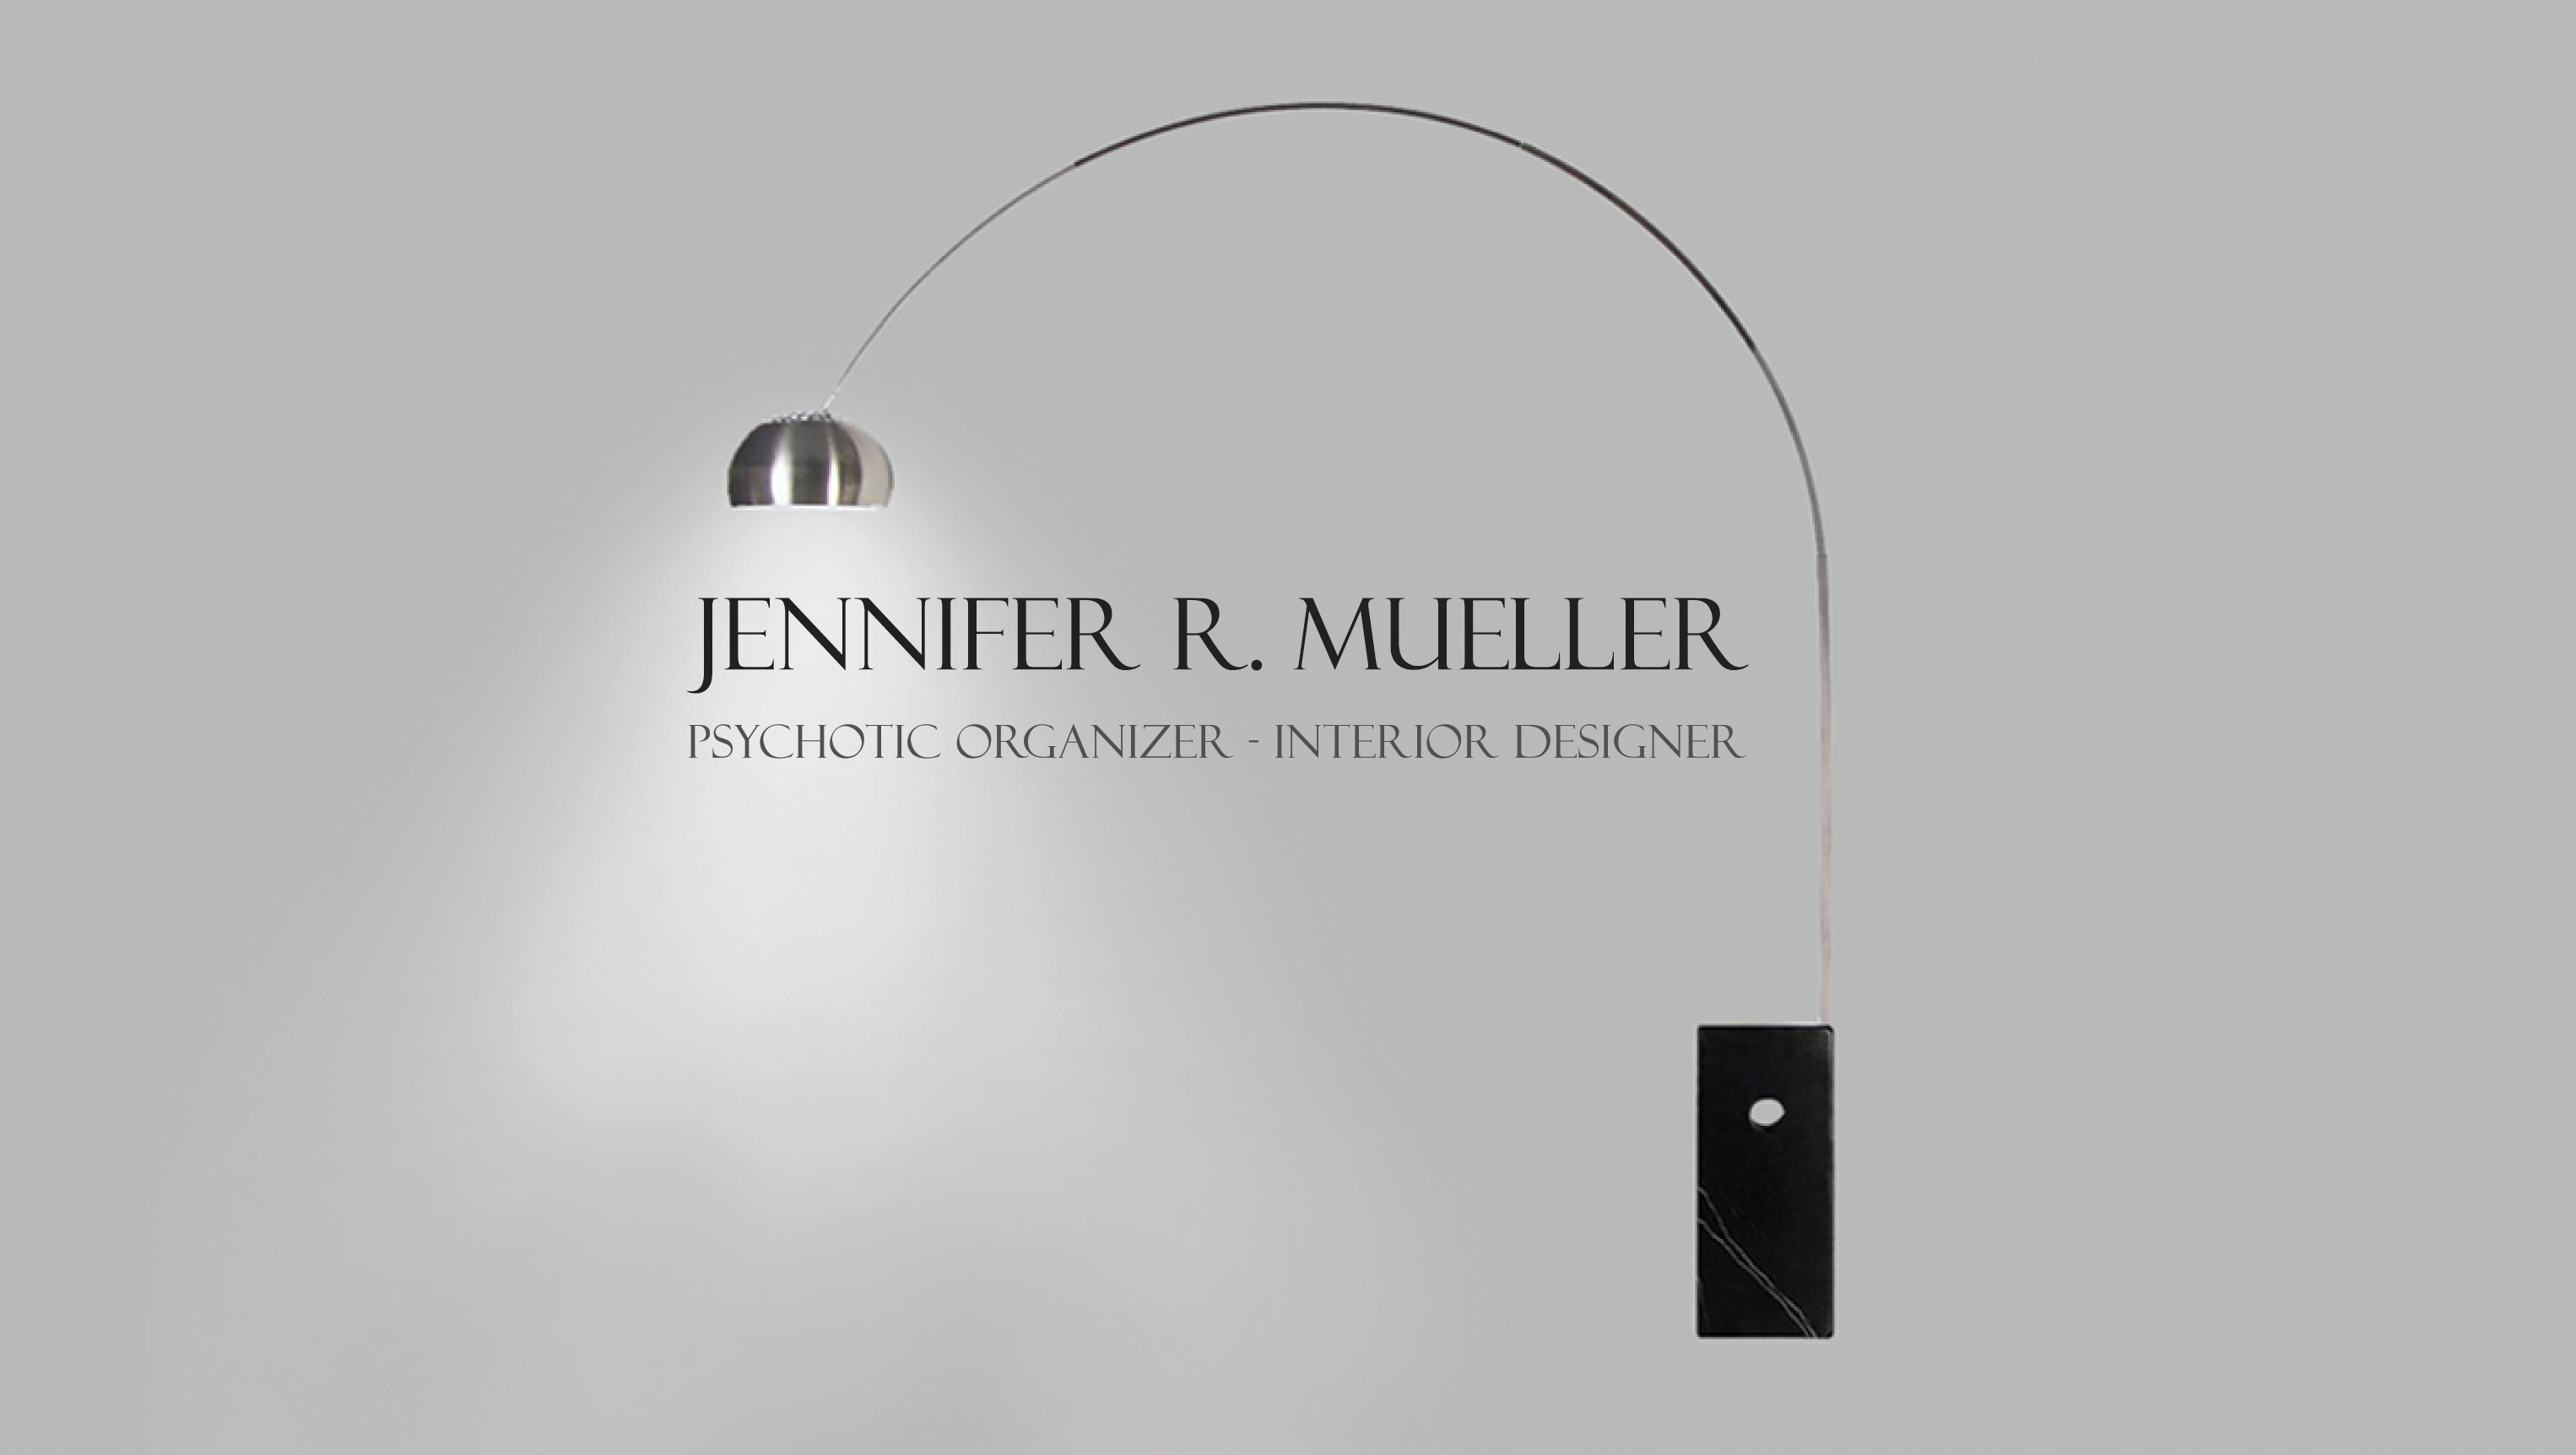 J. Mueller